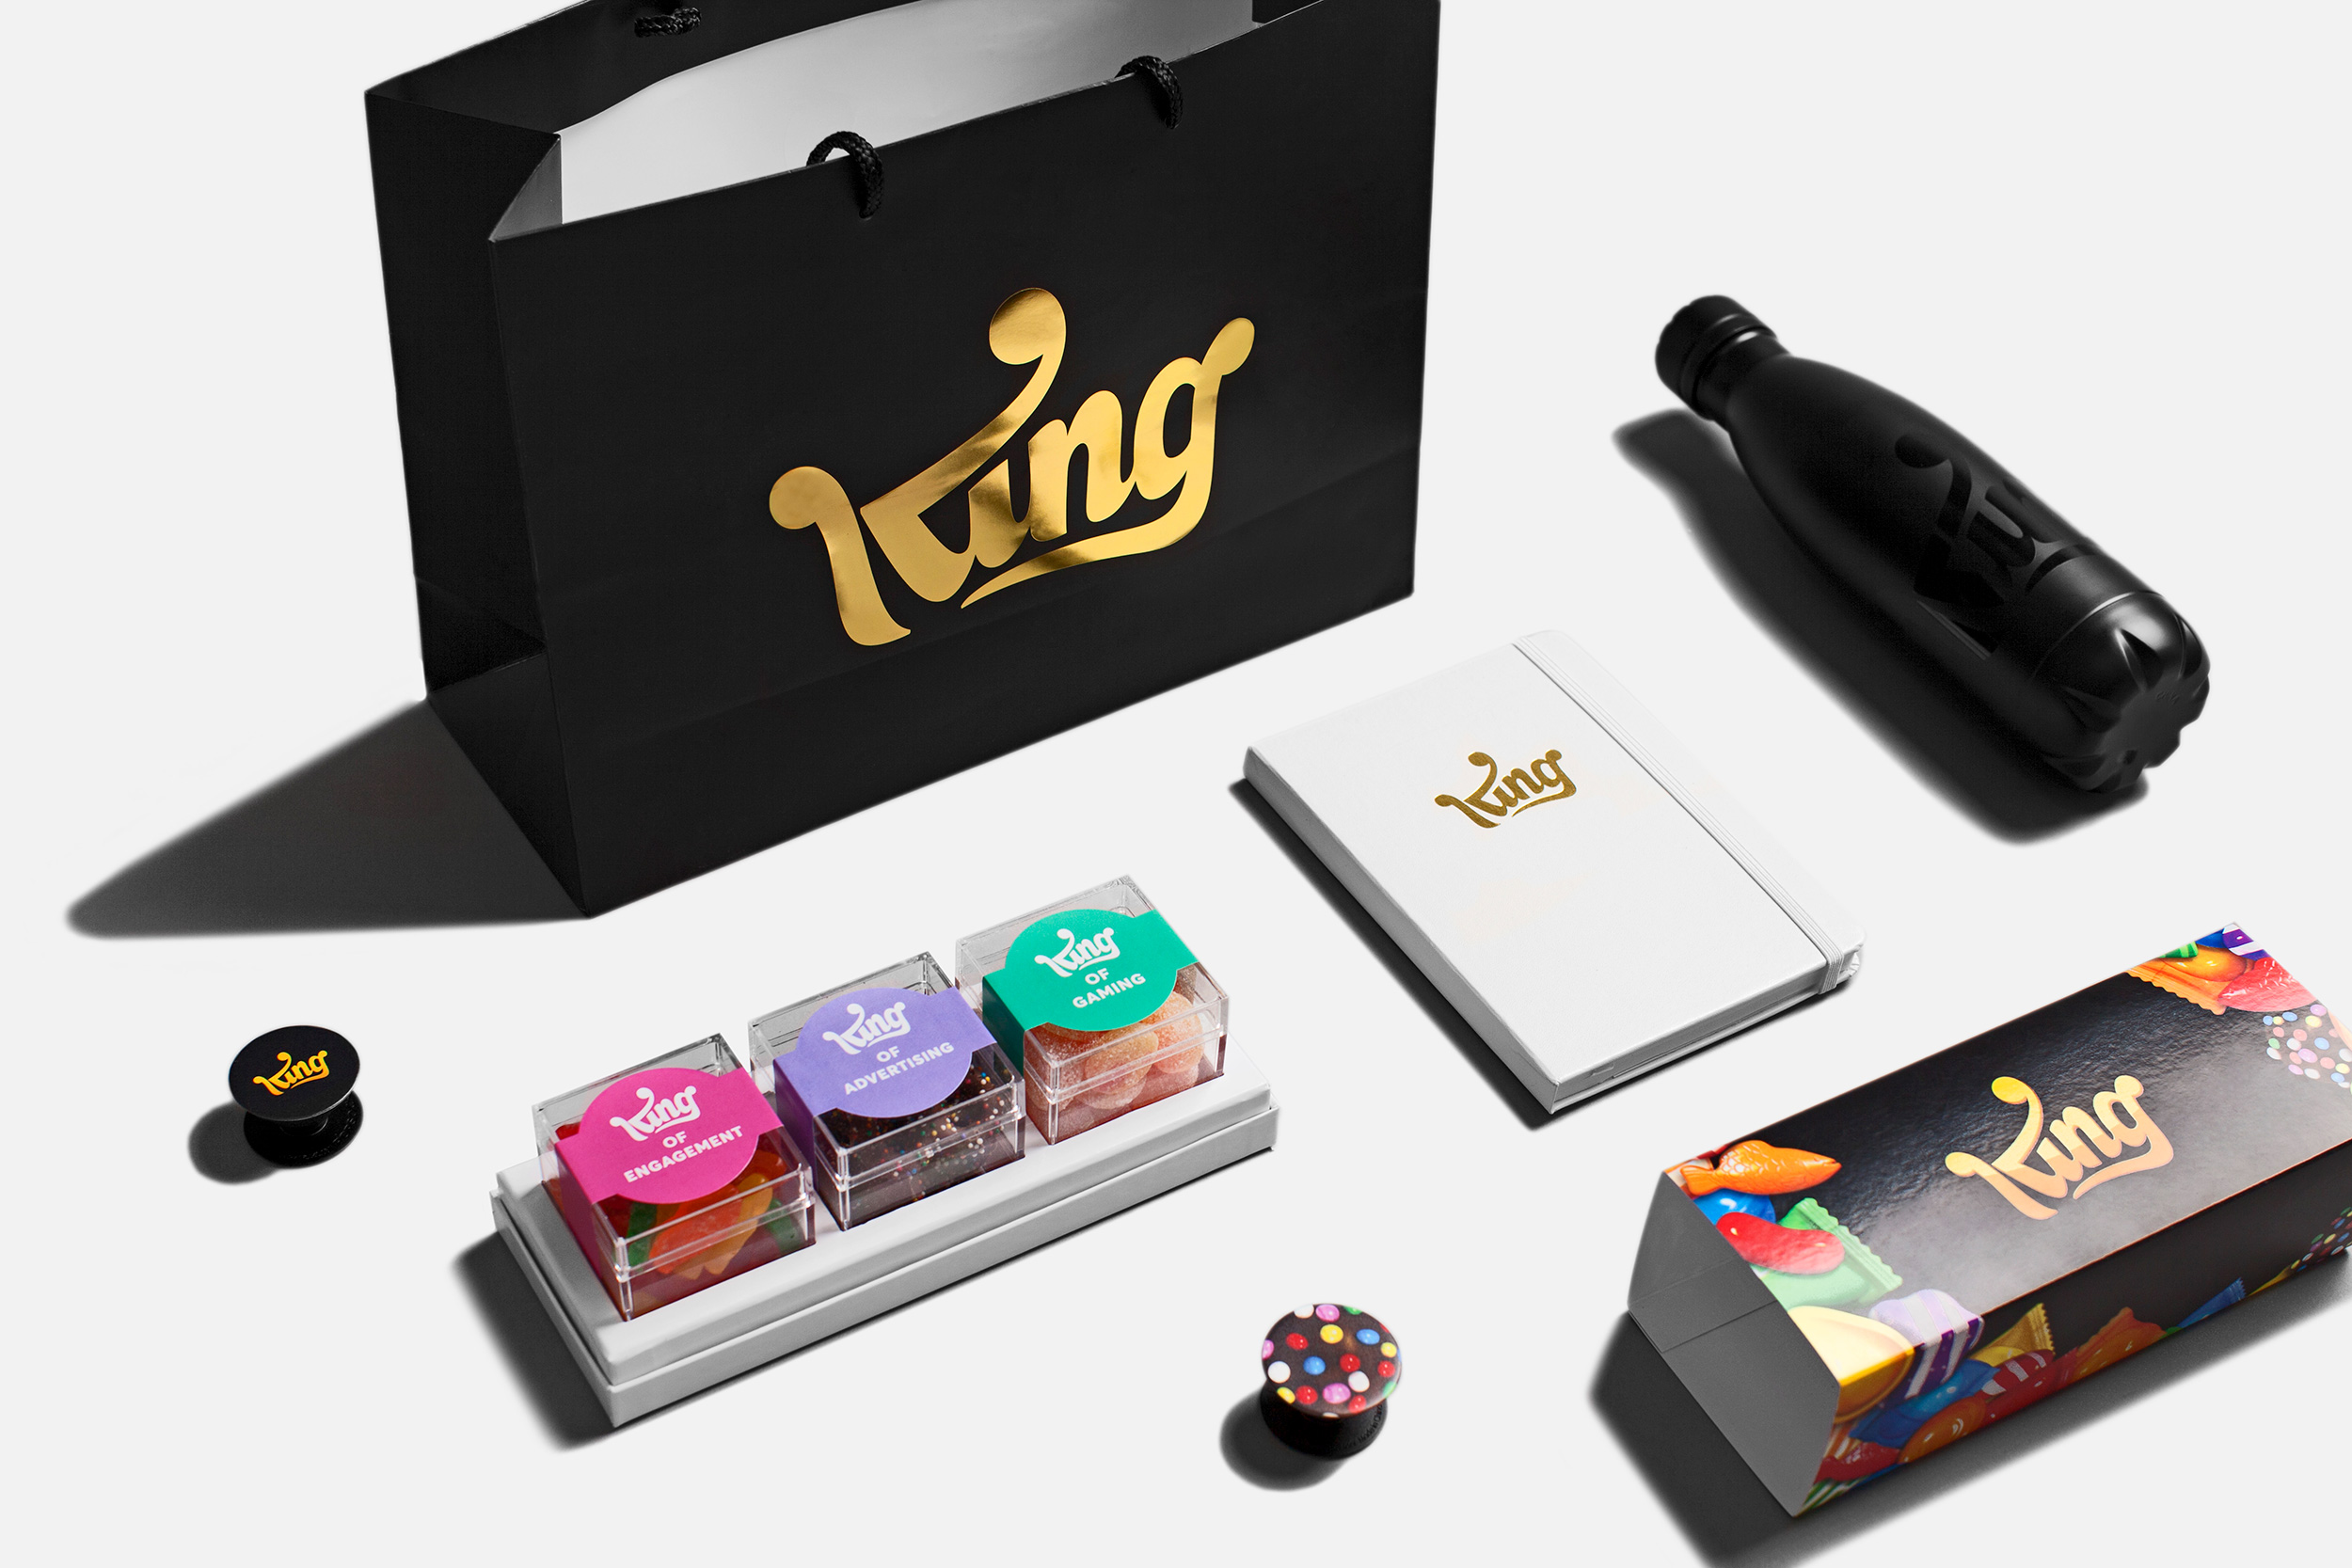 Case-Study-King-1.jpg